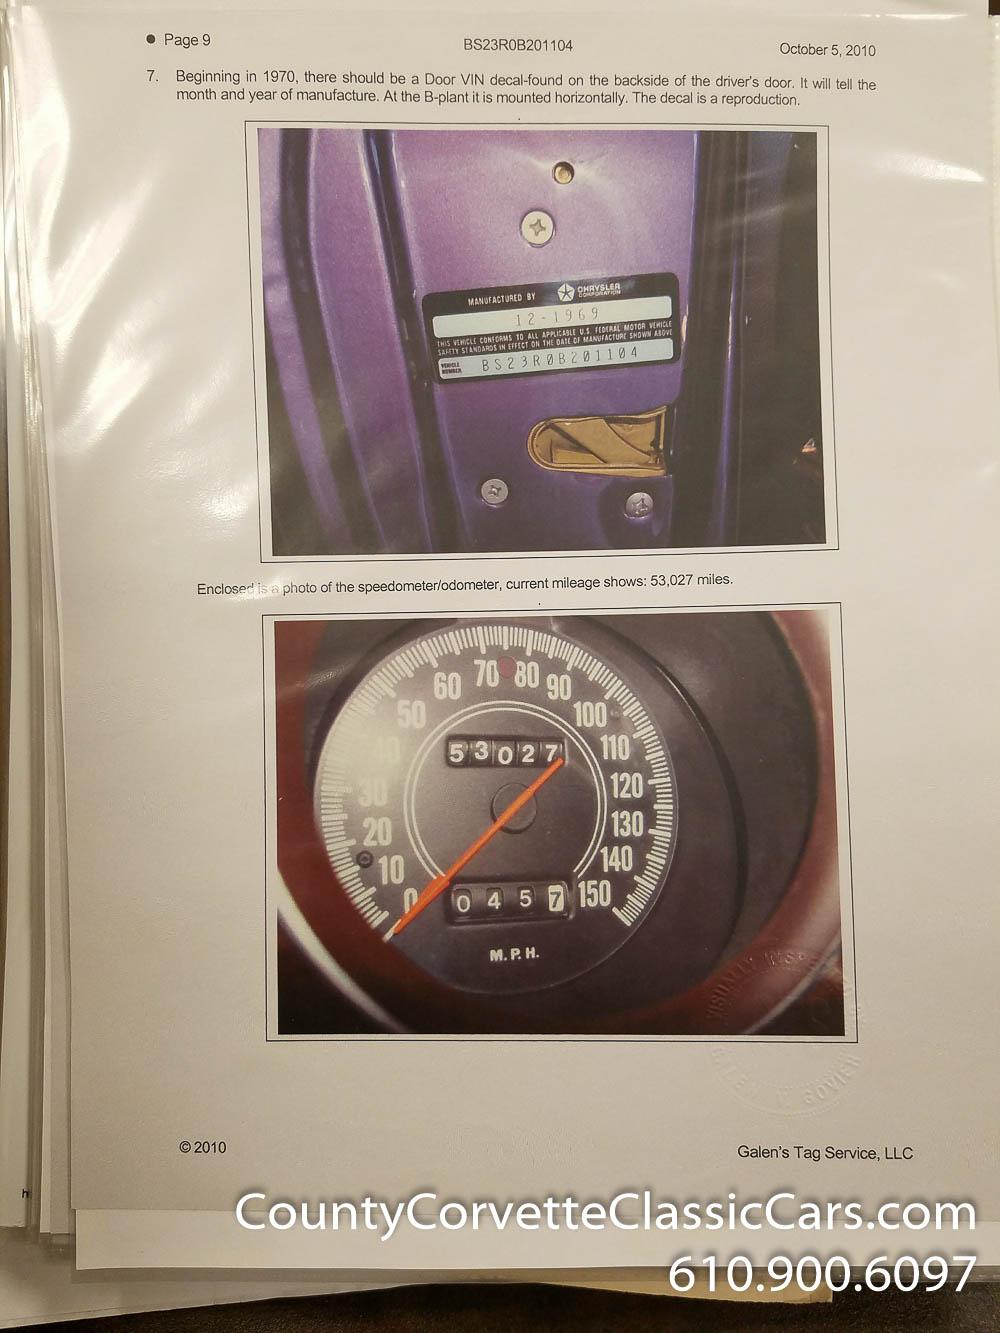 1970-Hemi-Cuda-for-sale-paperwork-14.jpg